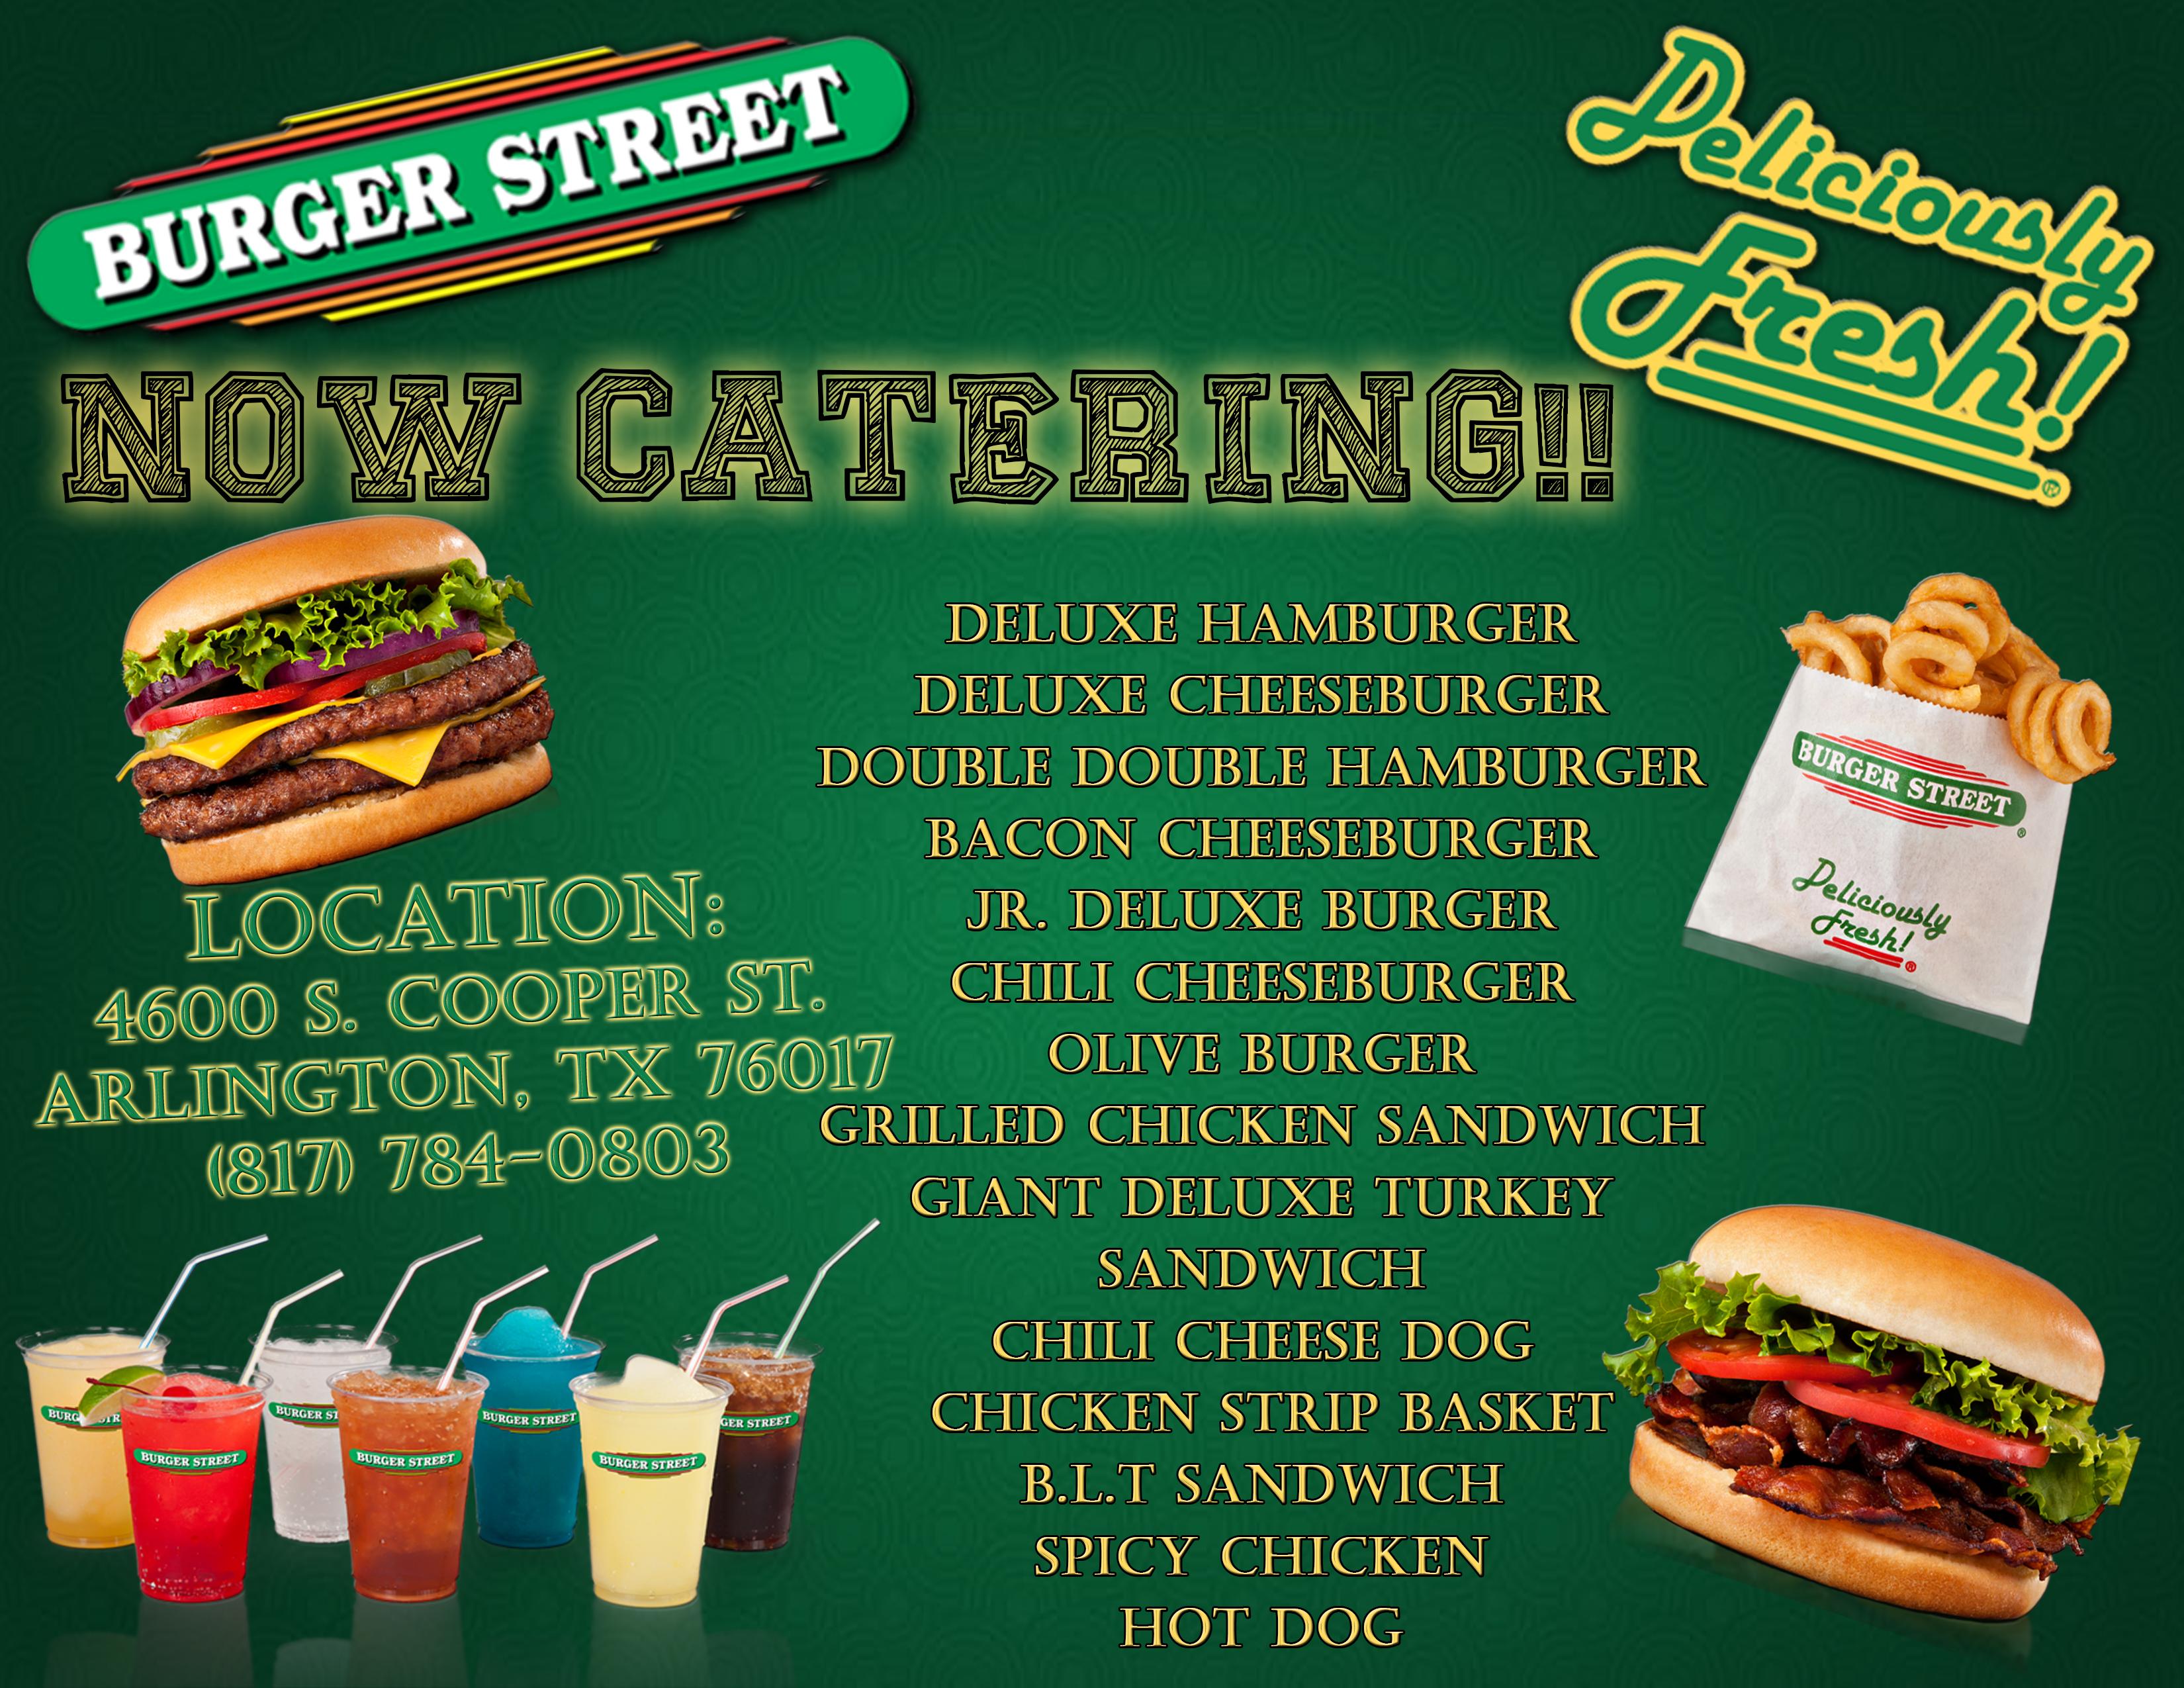 Burger_Street_Flyer